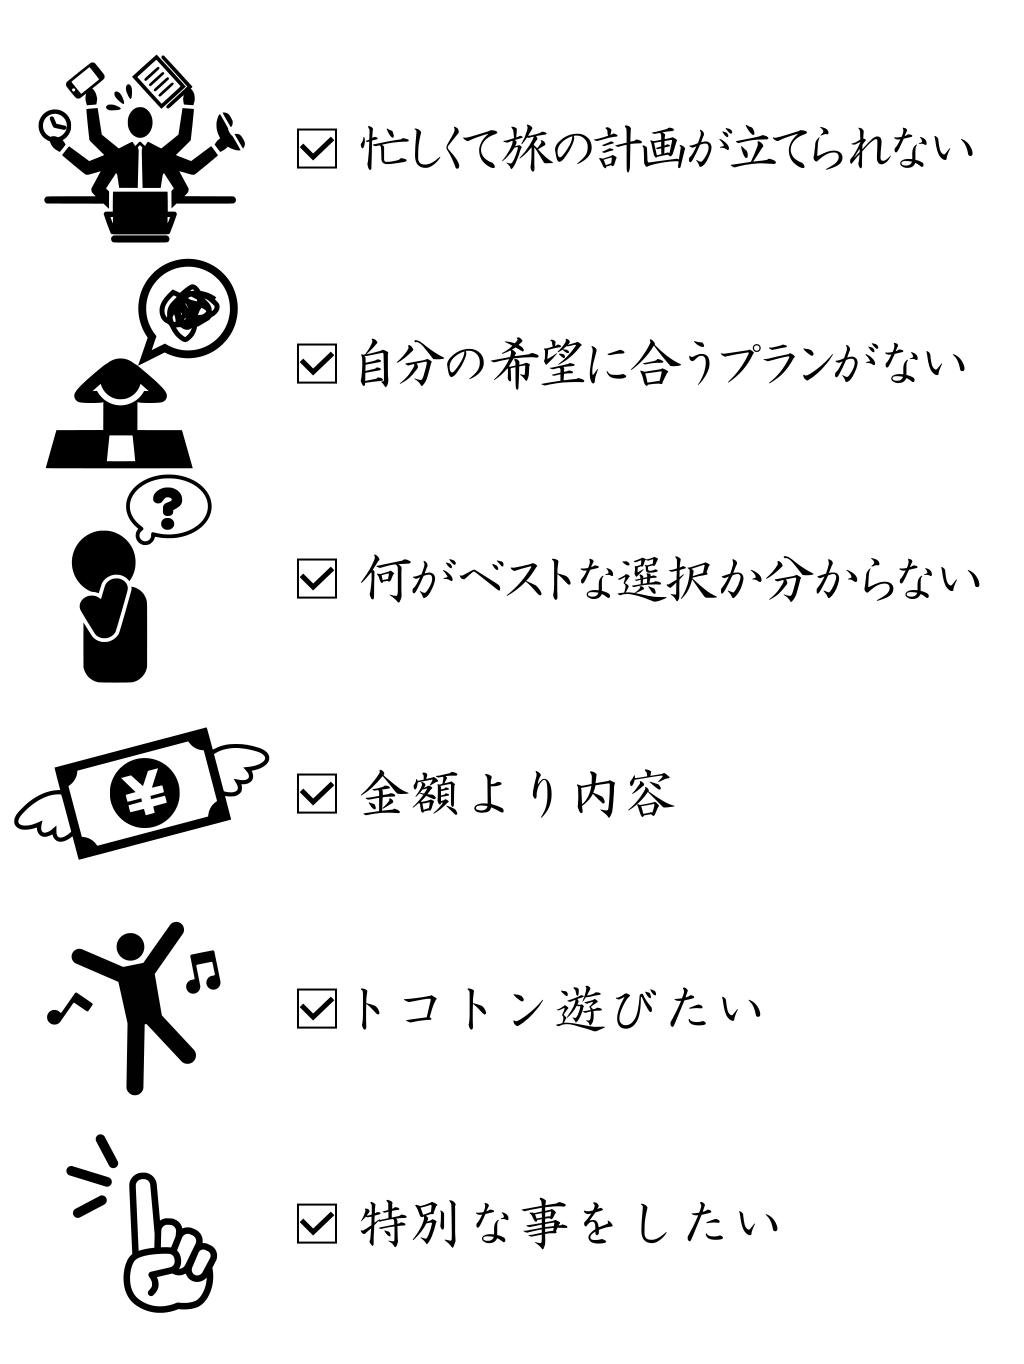 ESTE Japanを利用している方の簡略画像